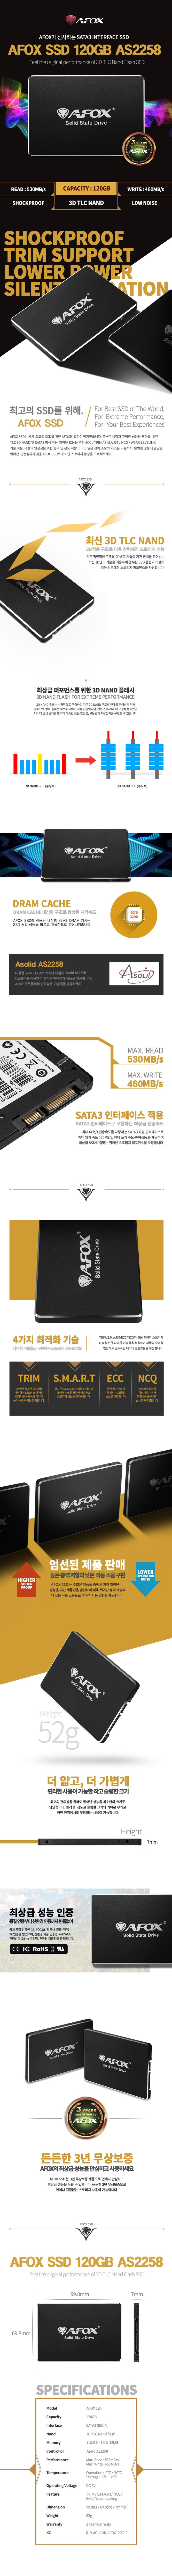 AFOX SSD 120GB AS2258.jpg